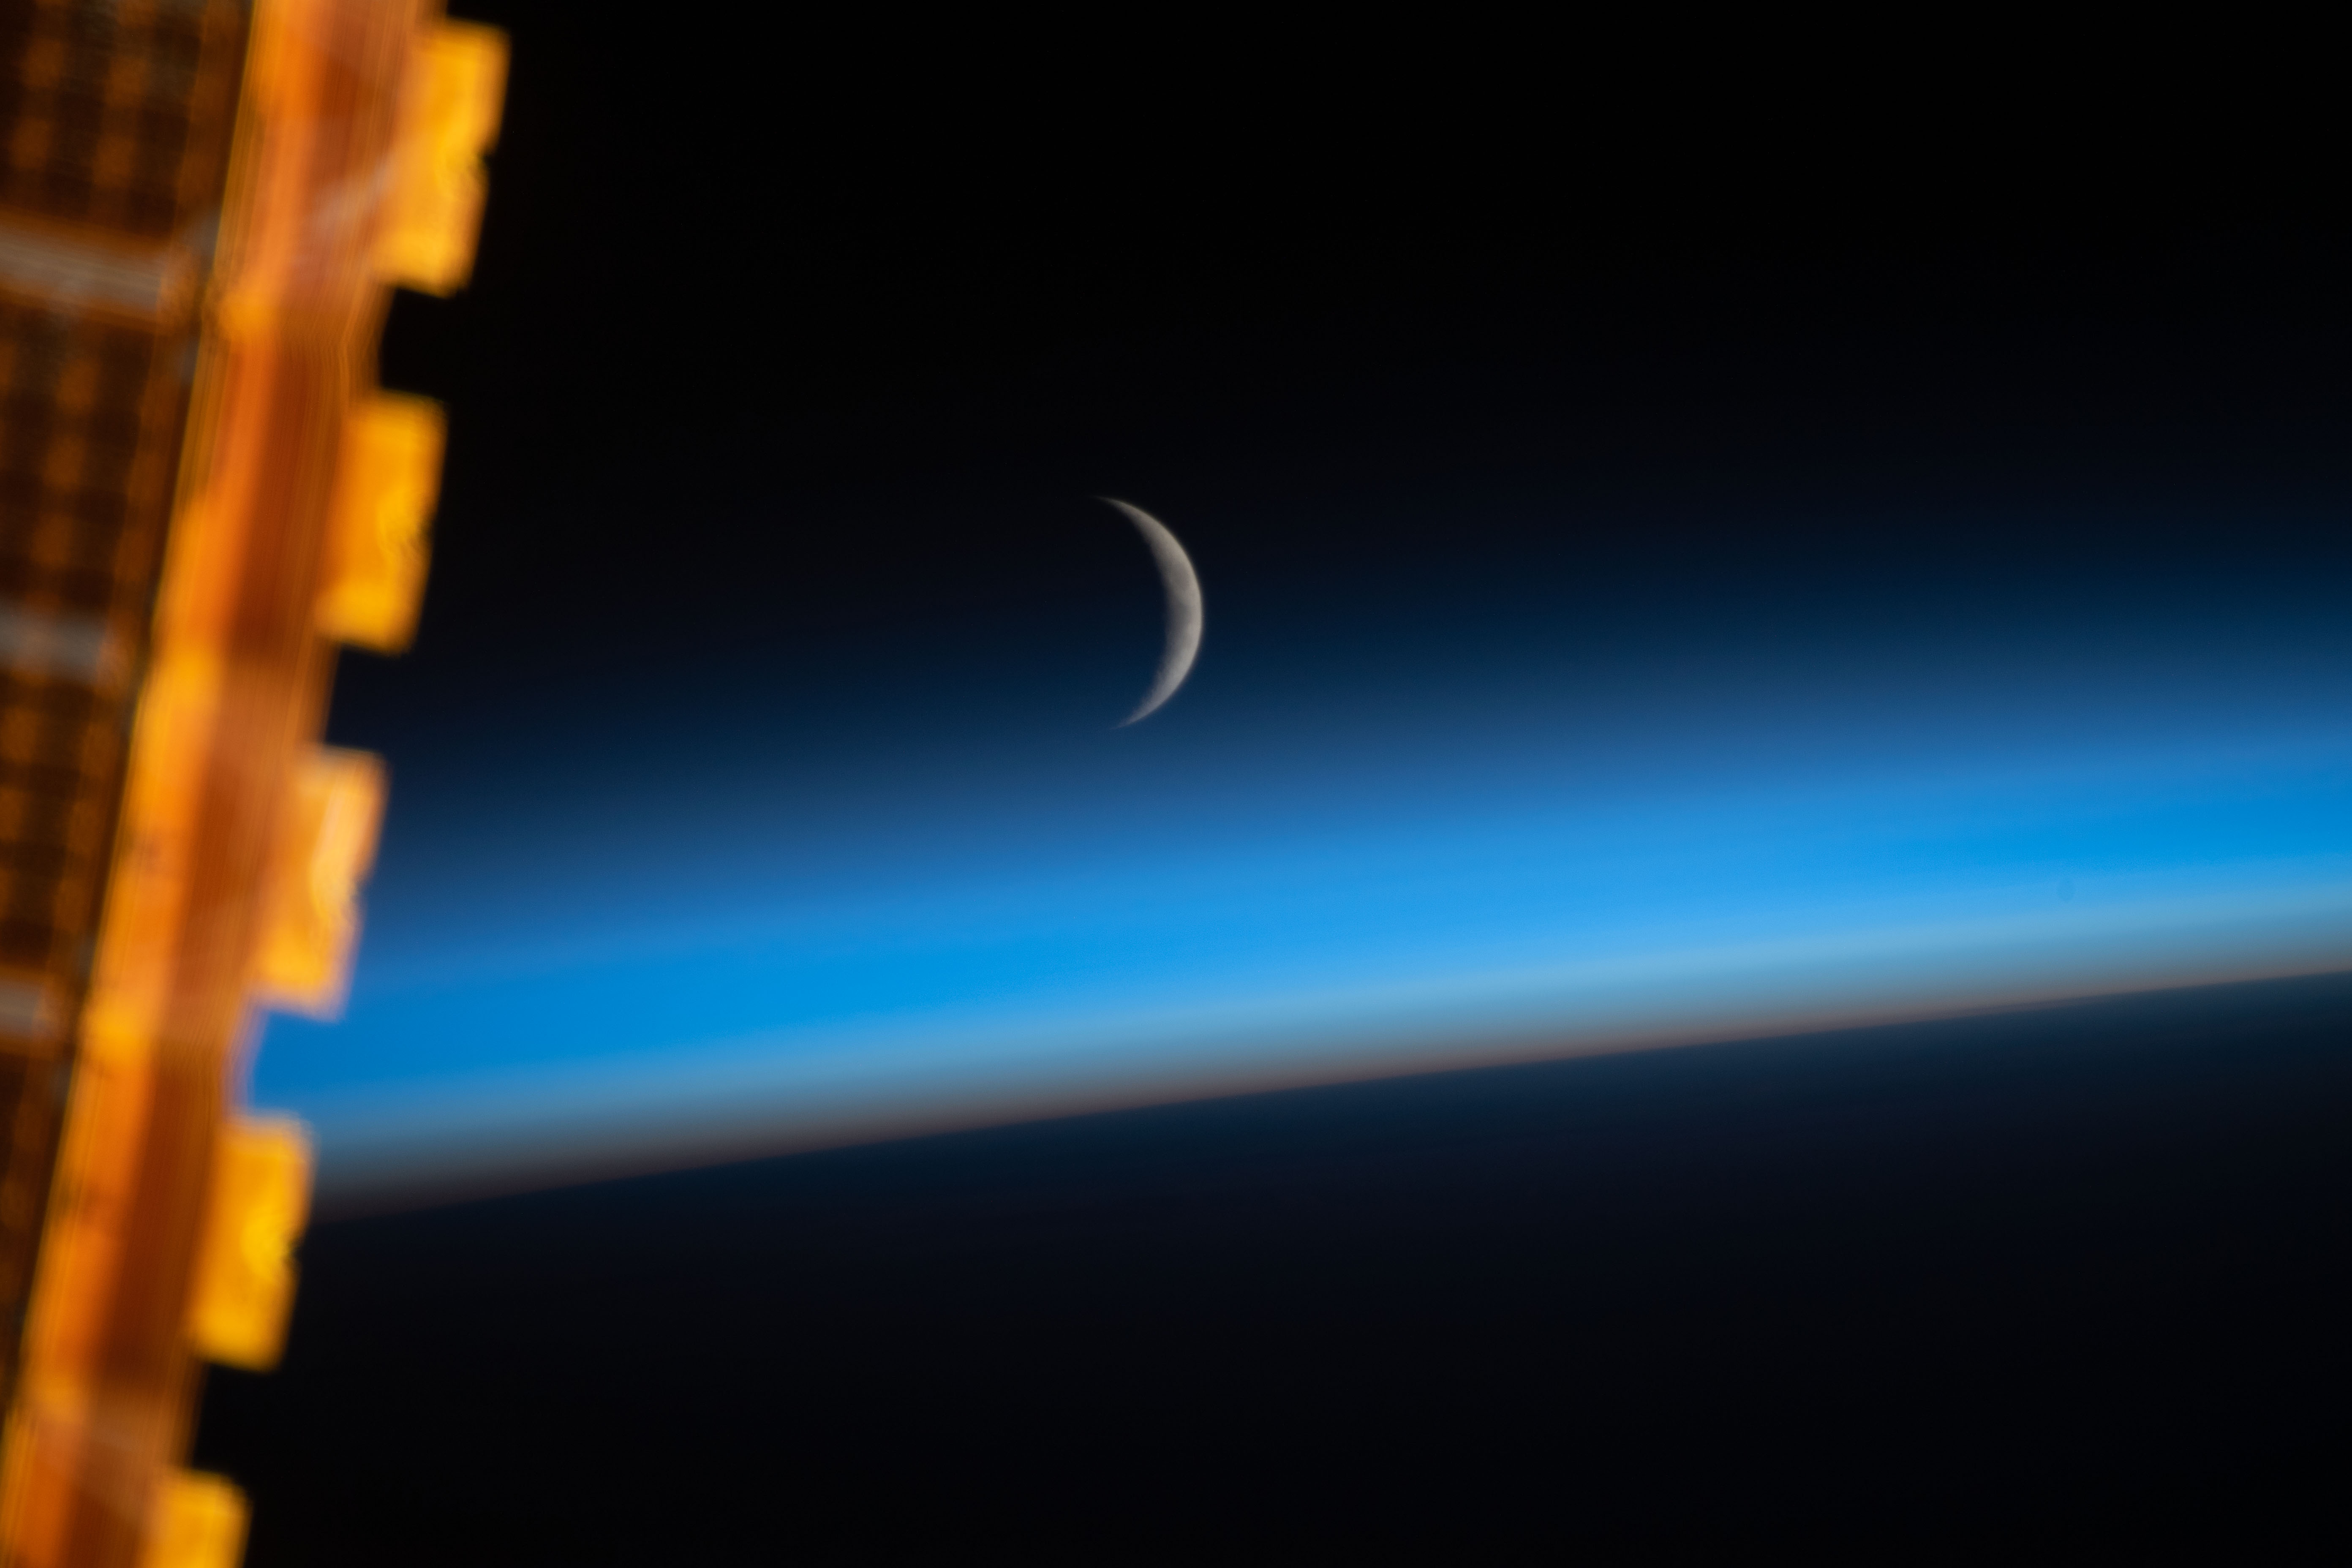 Waxing Crescent Moon Above Earths Limb